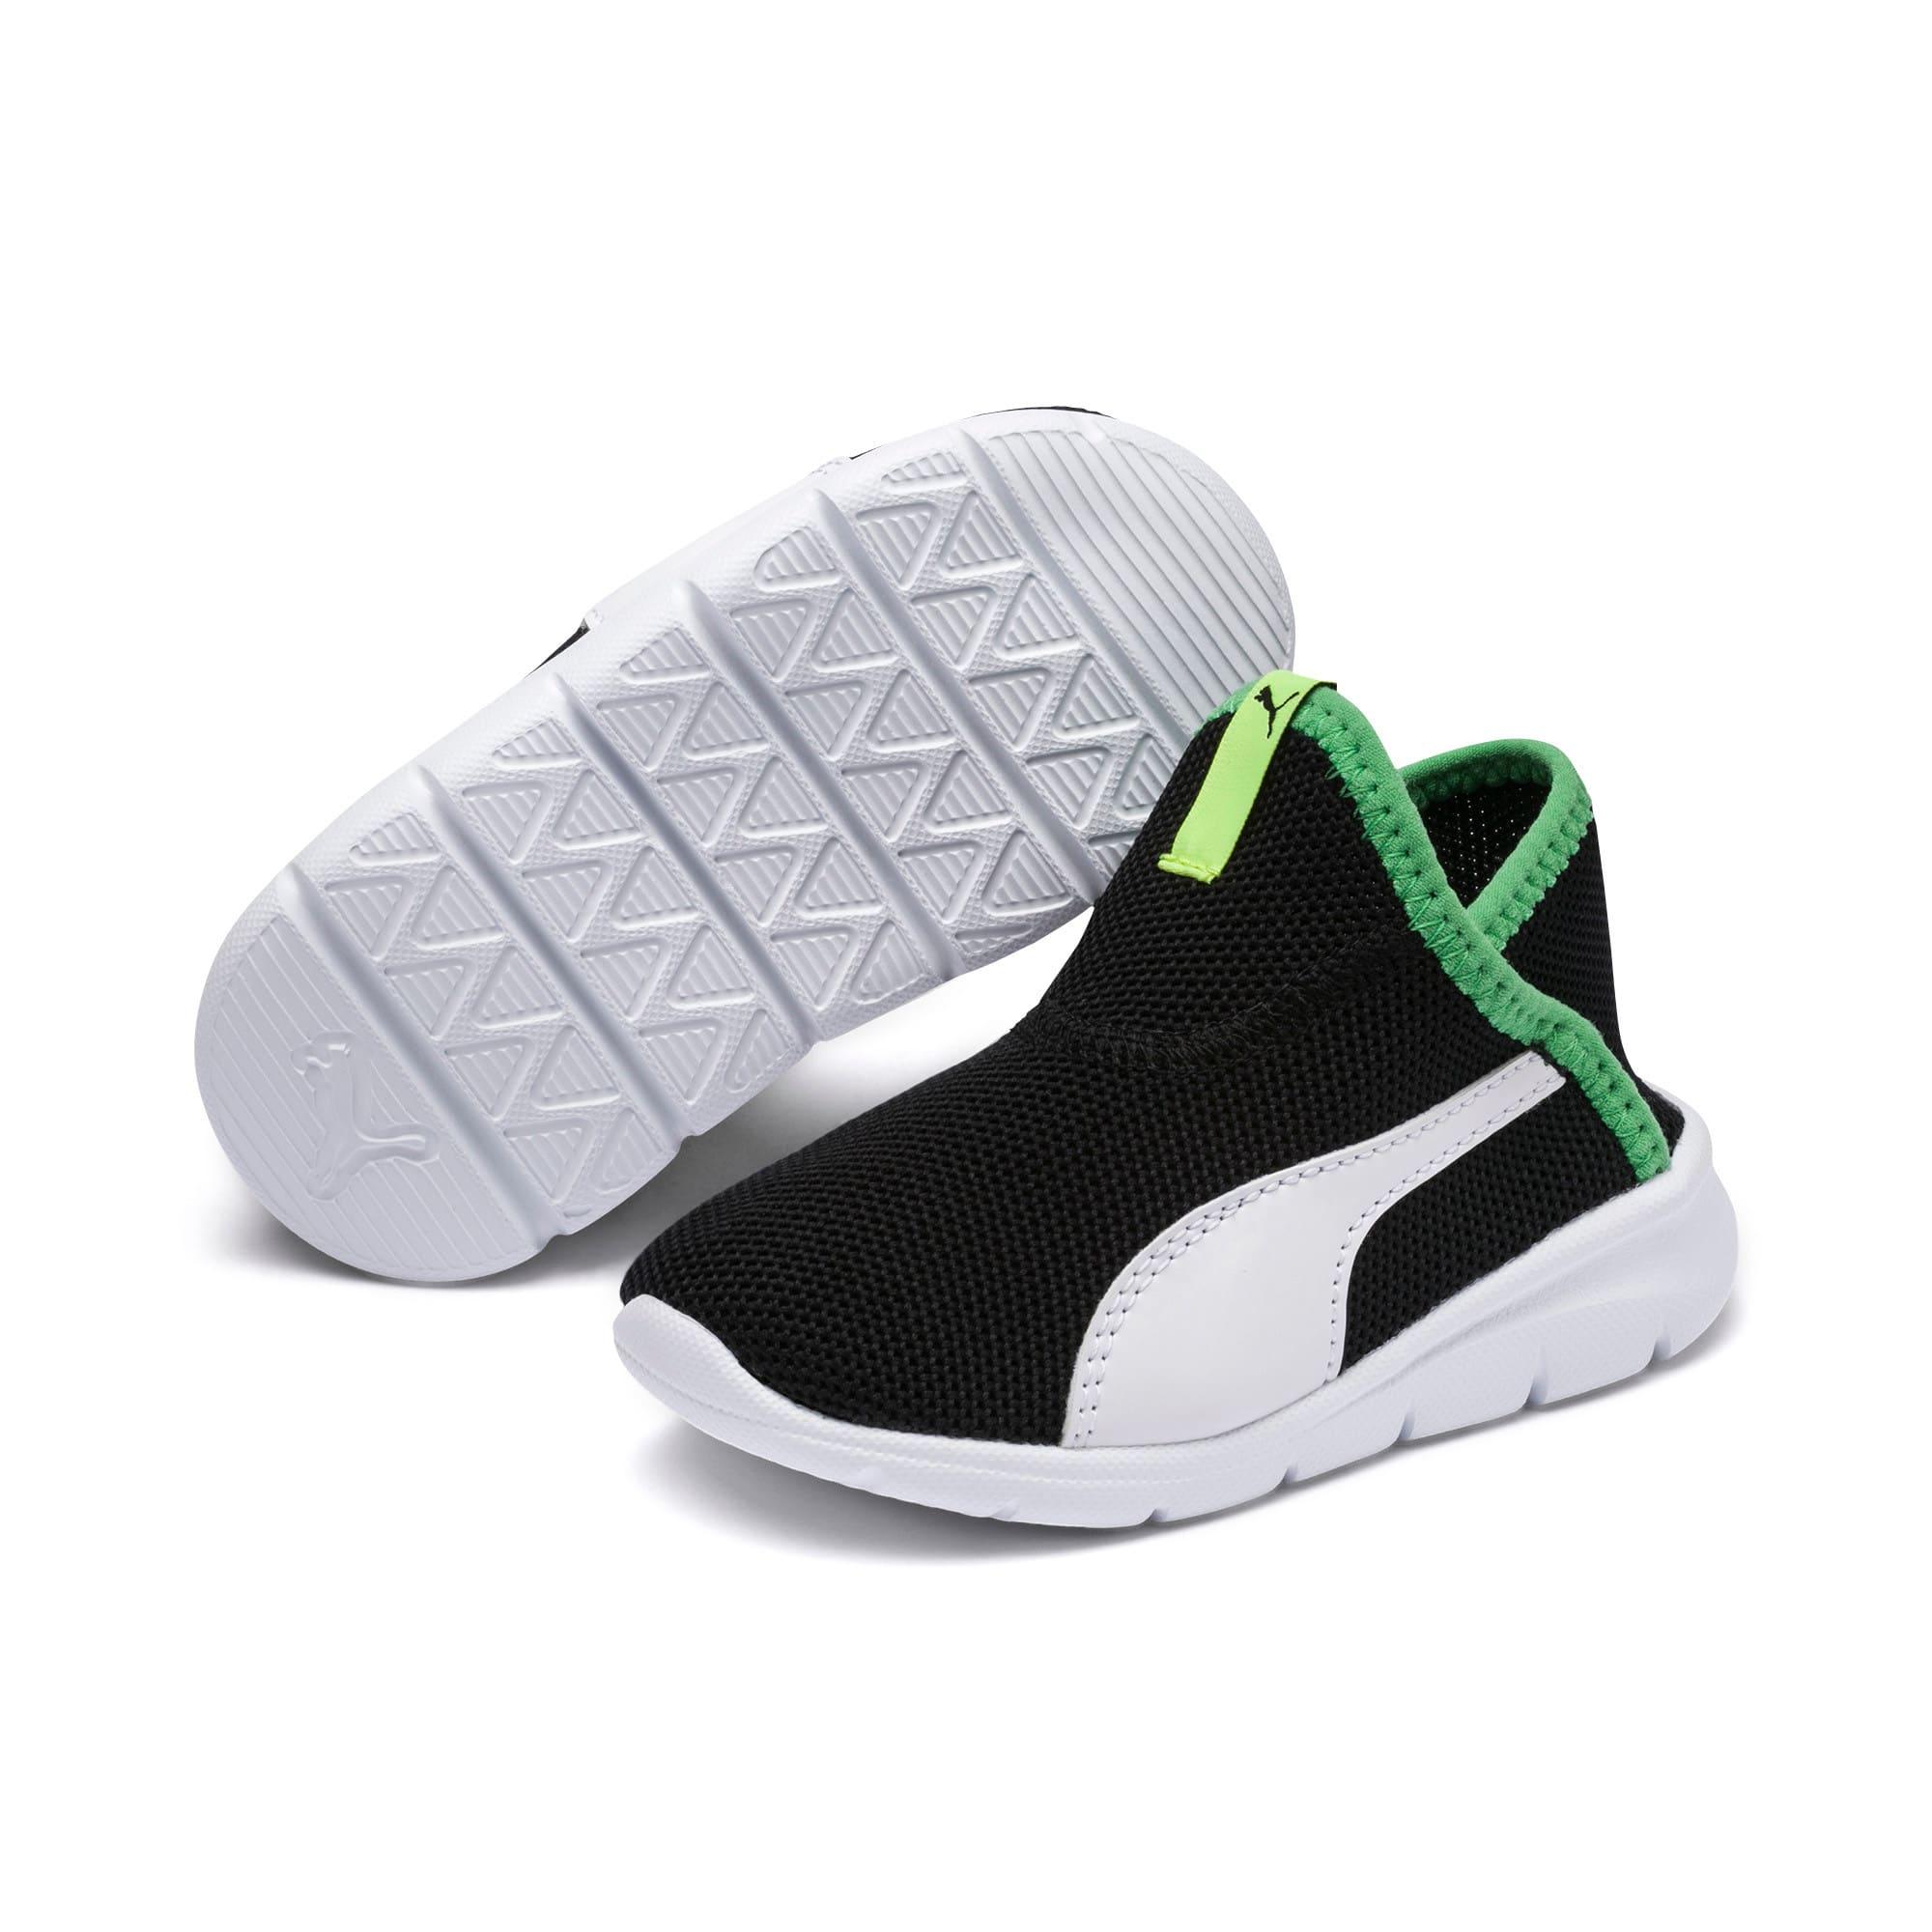 Thumbnail 2 of キッズ プーマ バオ 3 ソック PS 17-21cm, Puma Black-White-Irish Green, medium-JPN